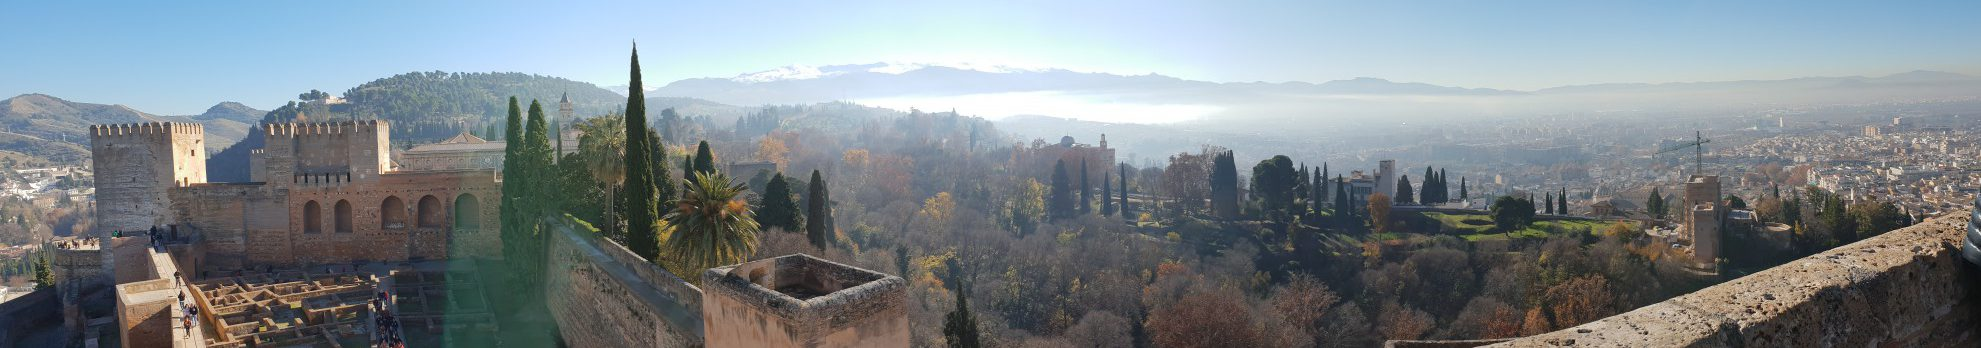 Visita Granada